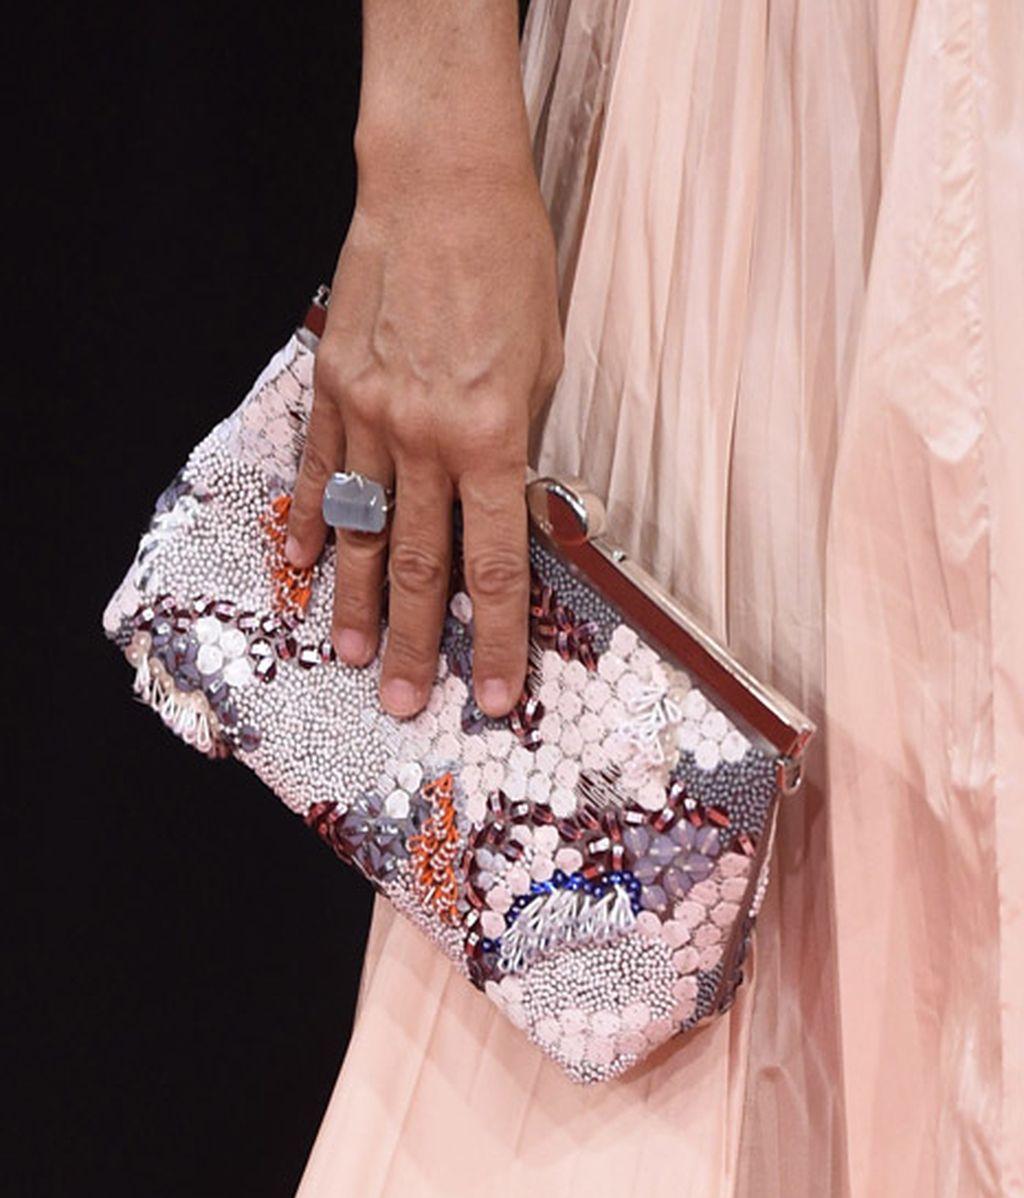 Un detalle del bolso de Cayetana Guillén Cuervo